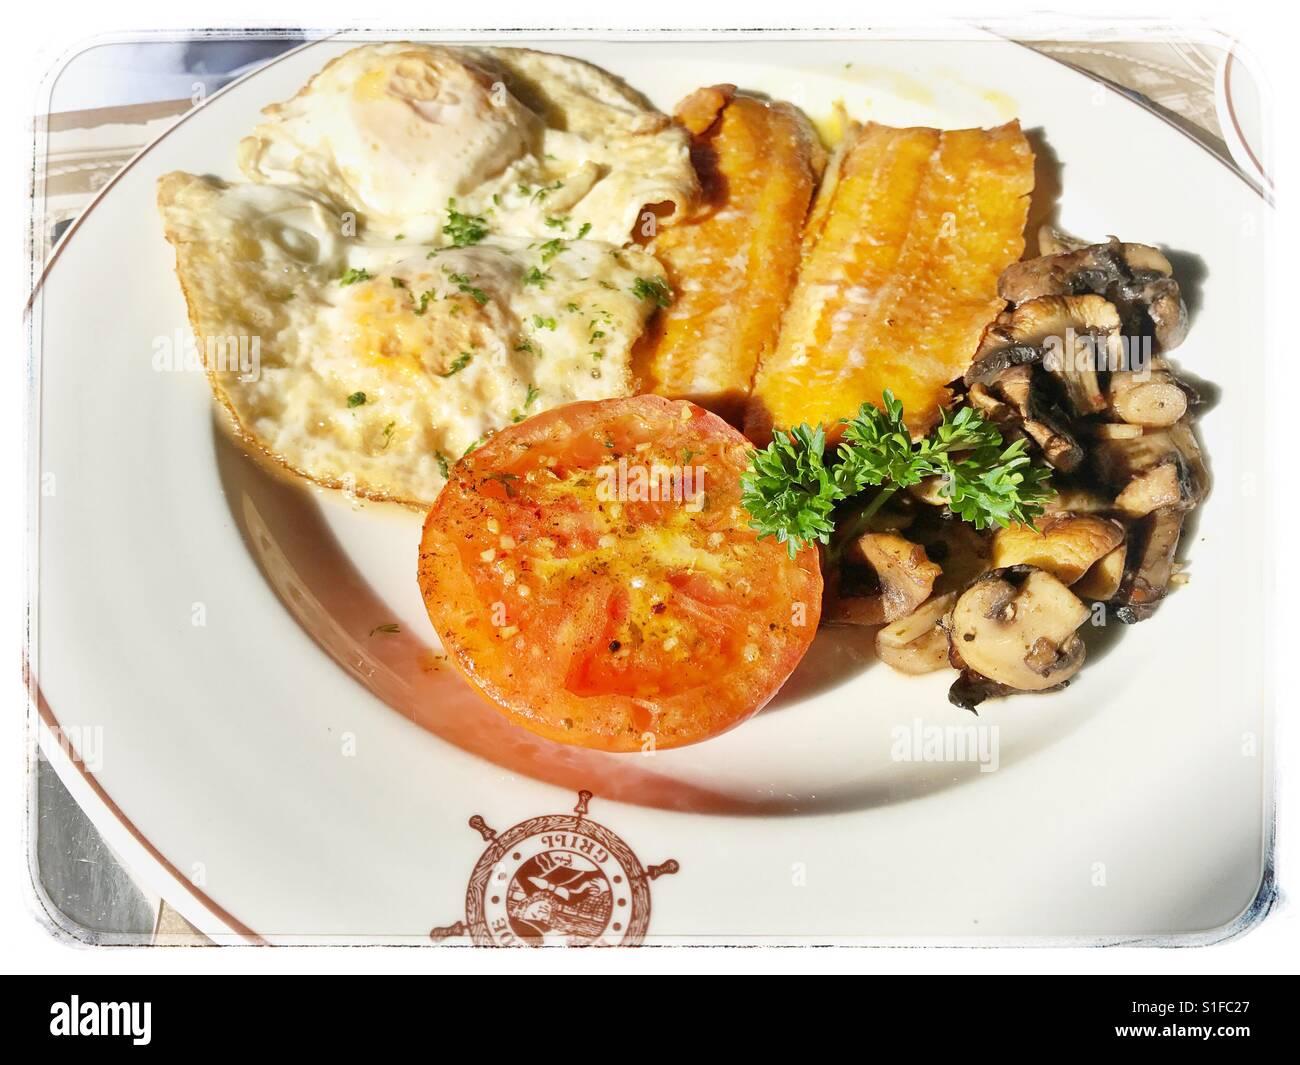 Kipper breakfast. - Stock Image